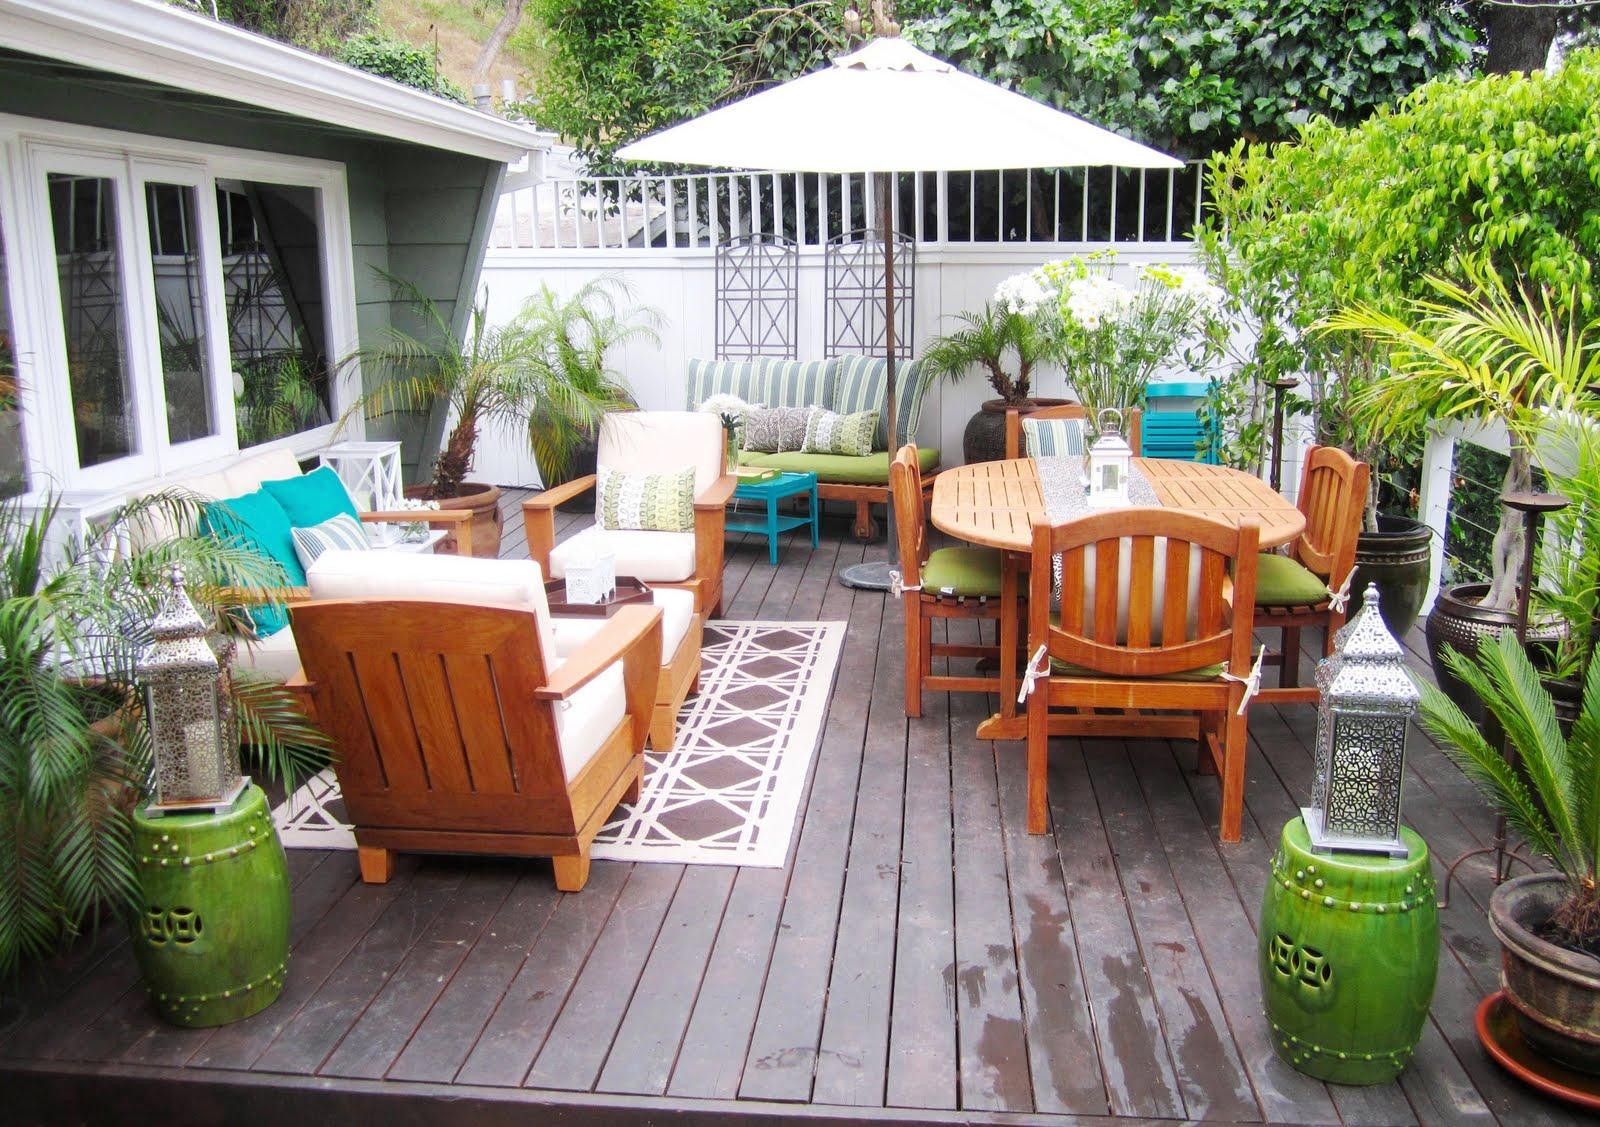 Backyard Beauty; Deck Makeover Galore! Guest